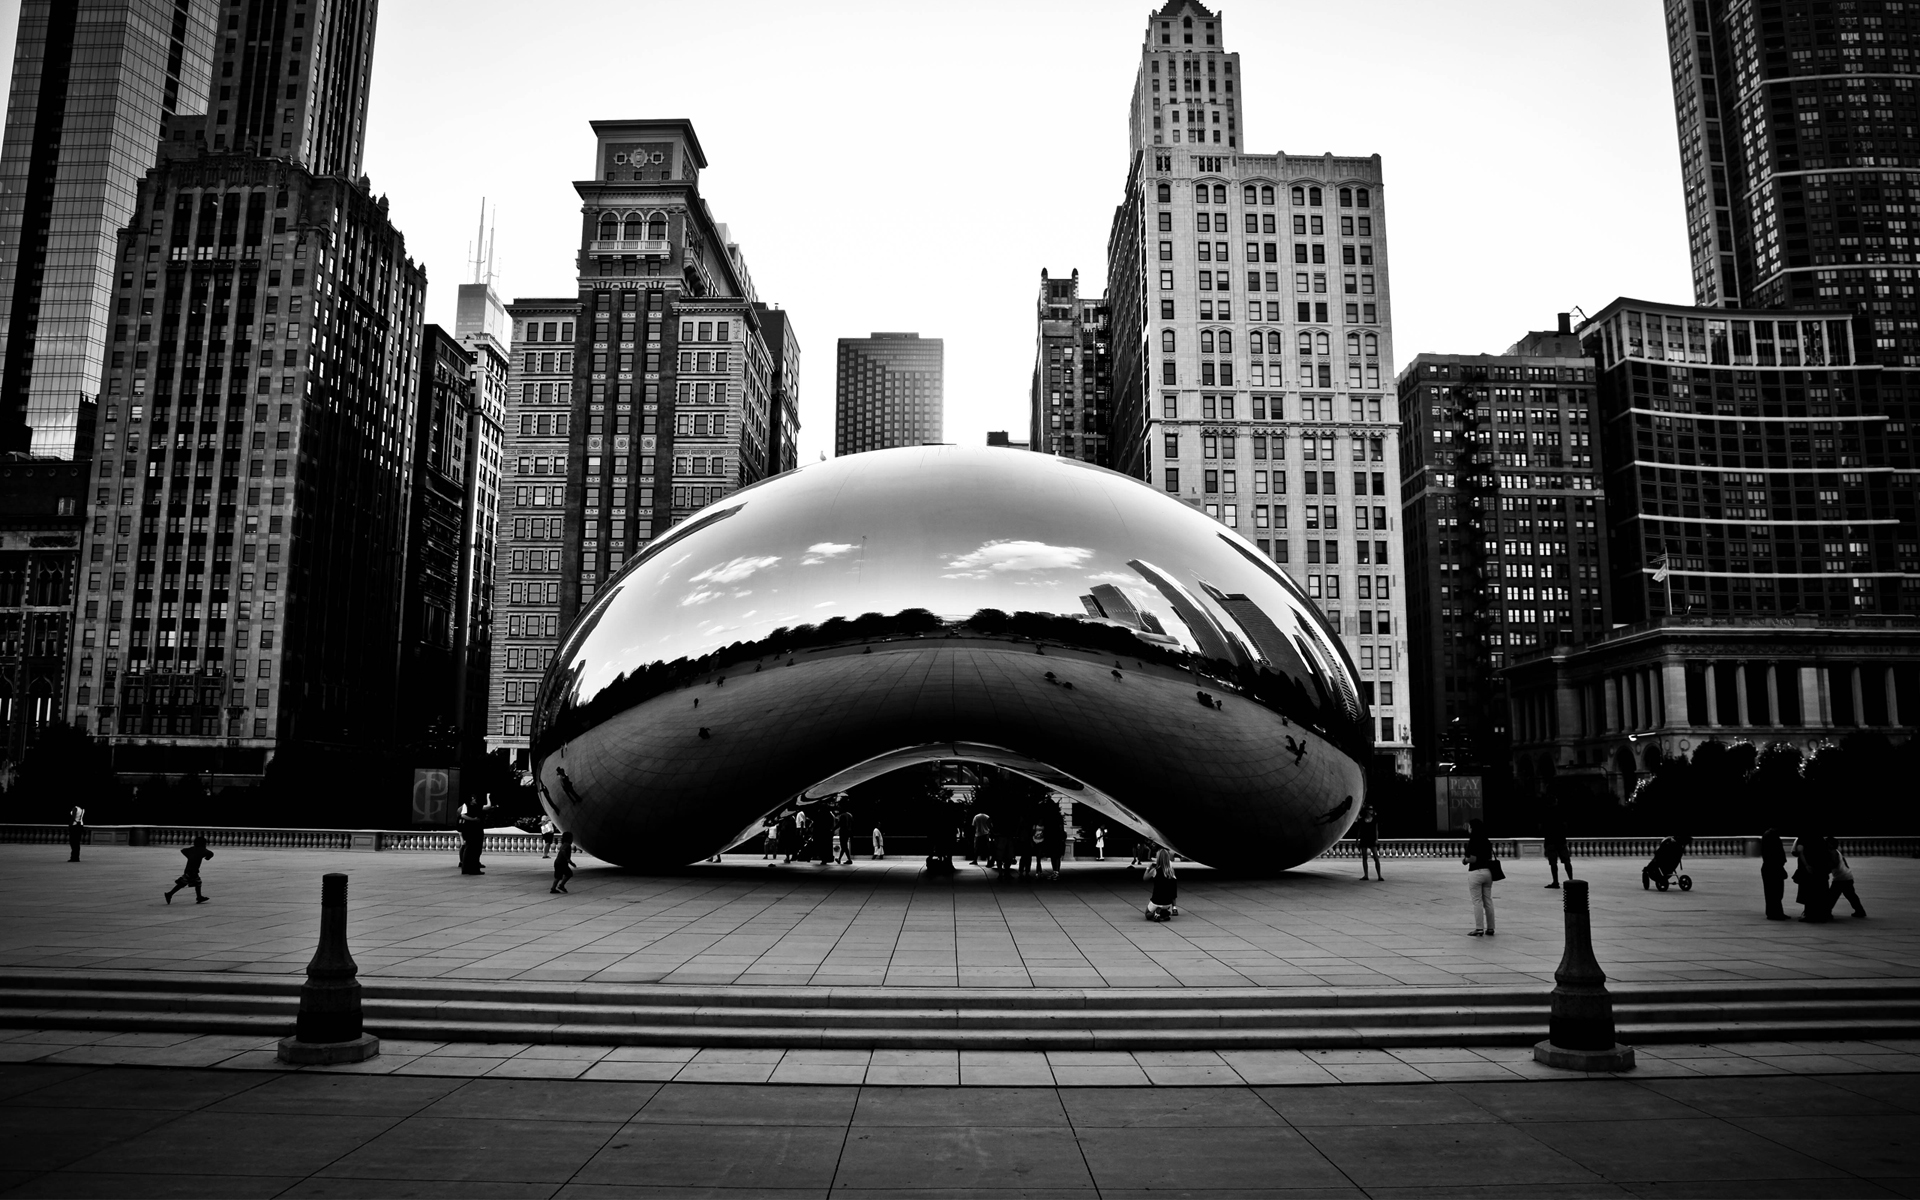 Cityscape photo wallpaper photography buildings photos Photography HD Wallpaper 1920x1200 px